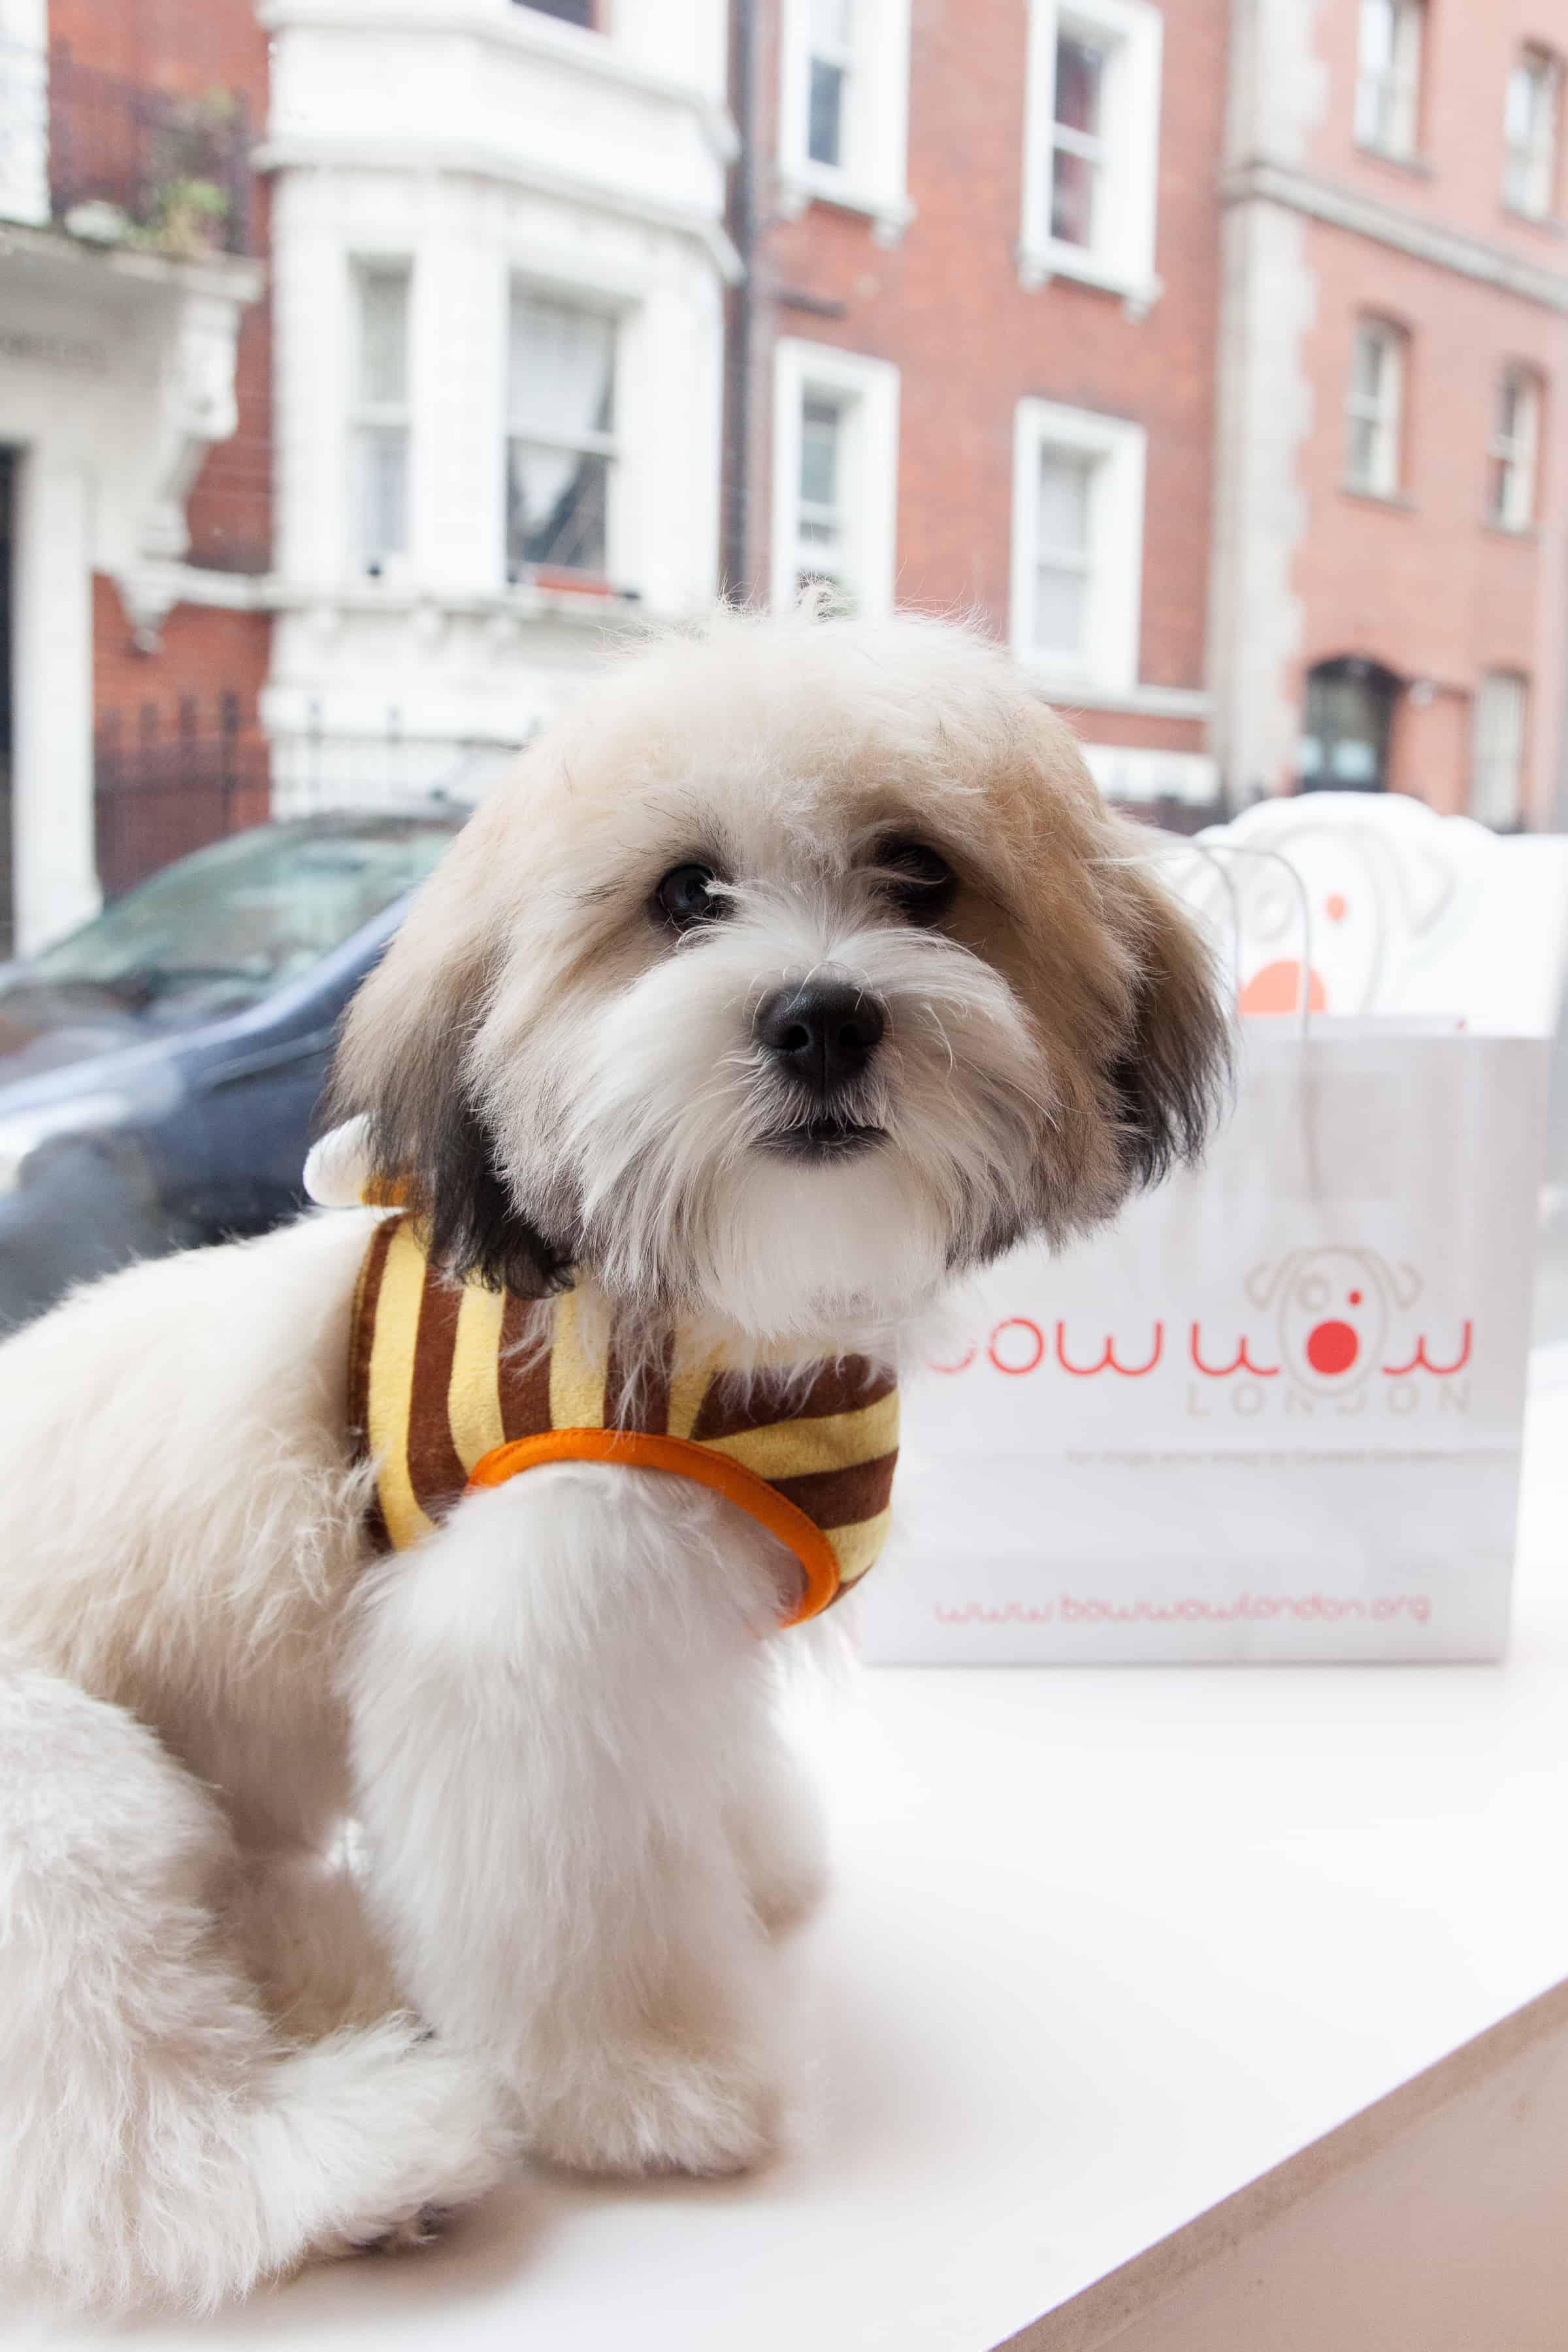 Celebrity Styling Dog Groomers - voofla.com